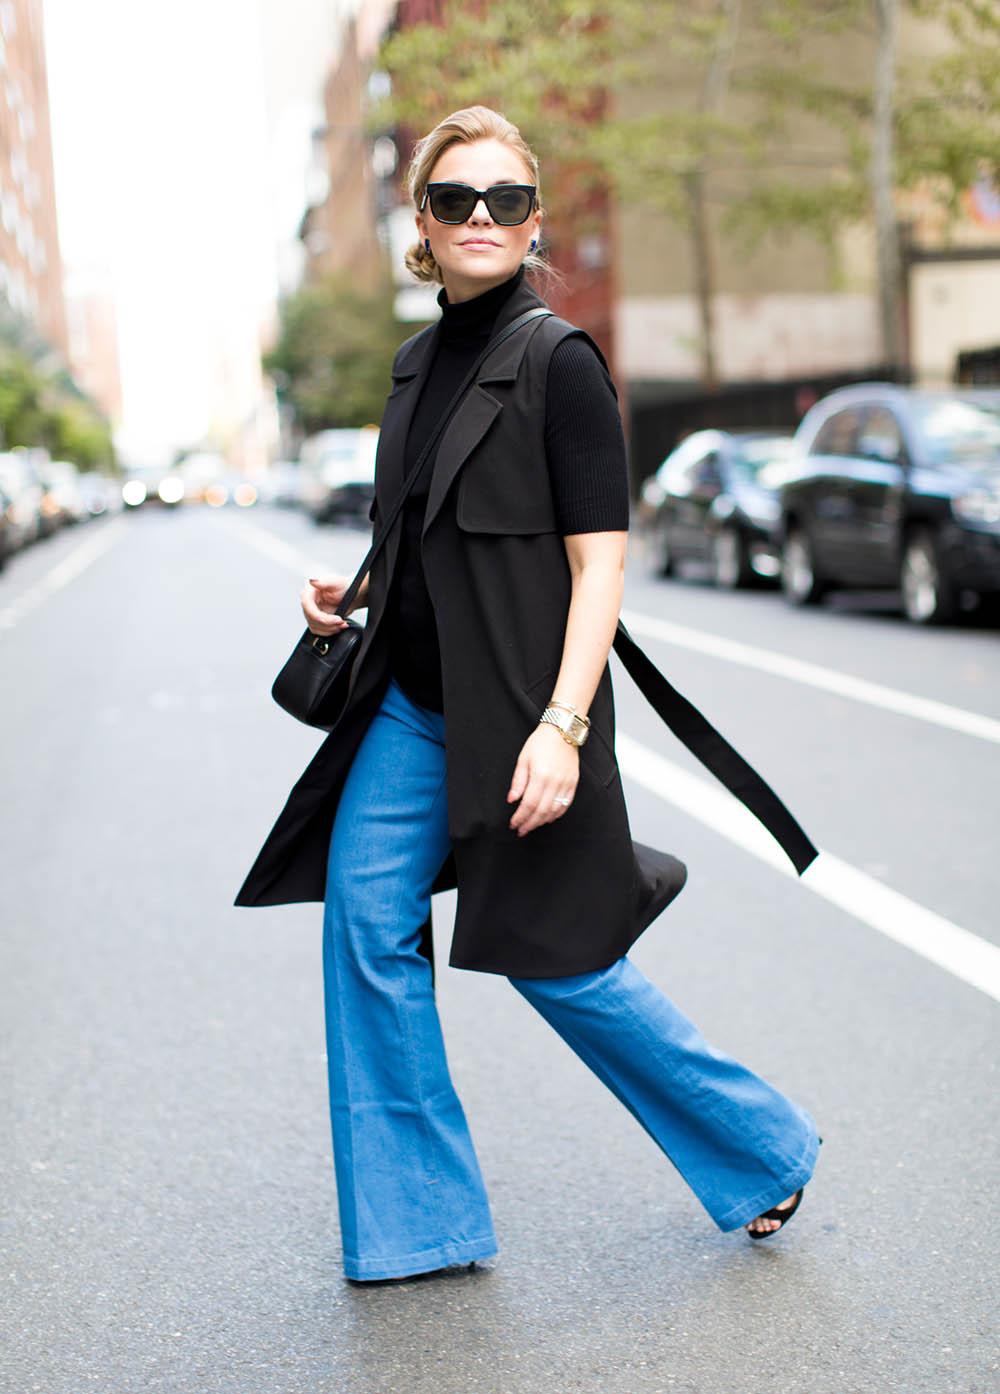 Cornblue Wide Leg Jeans